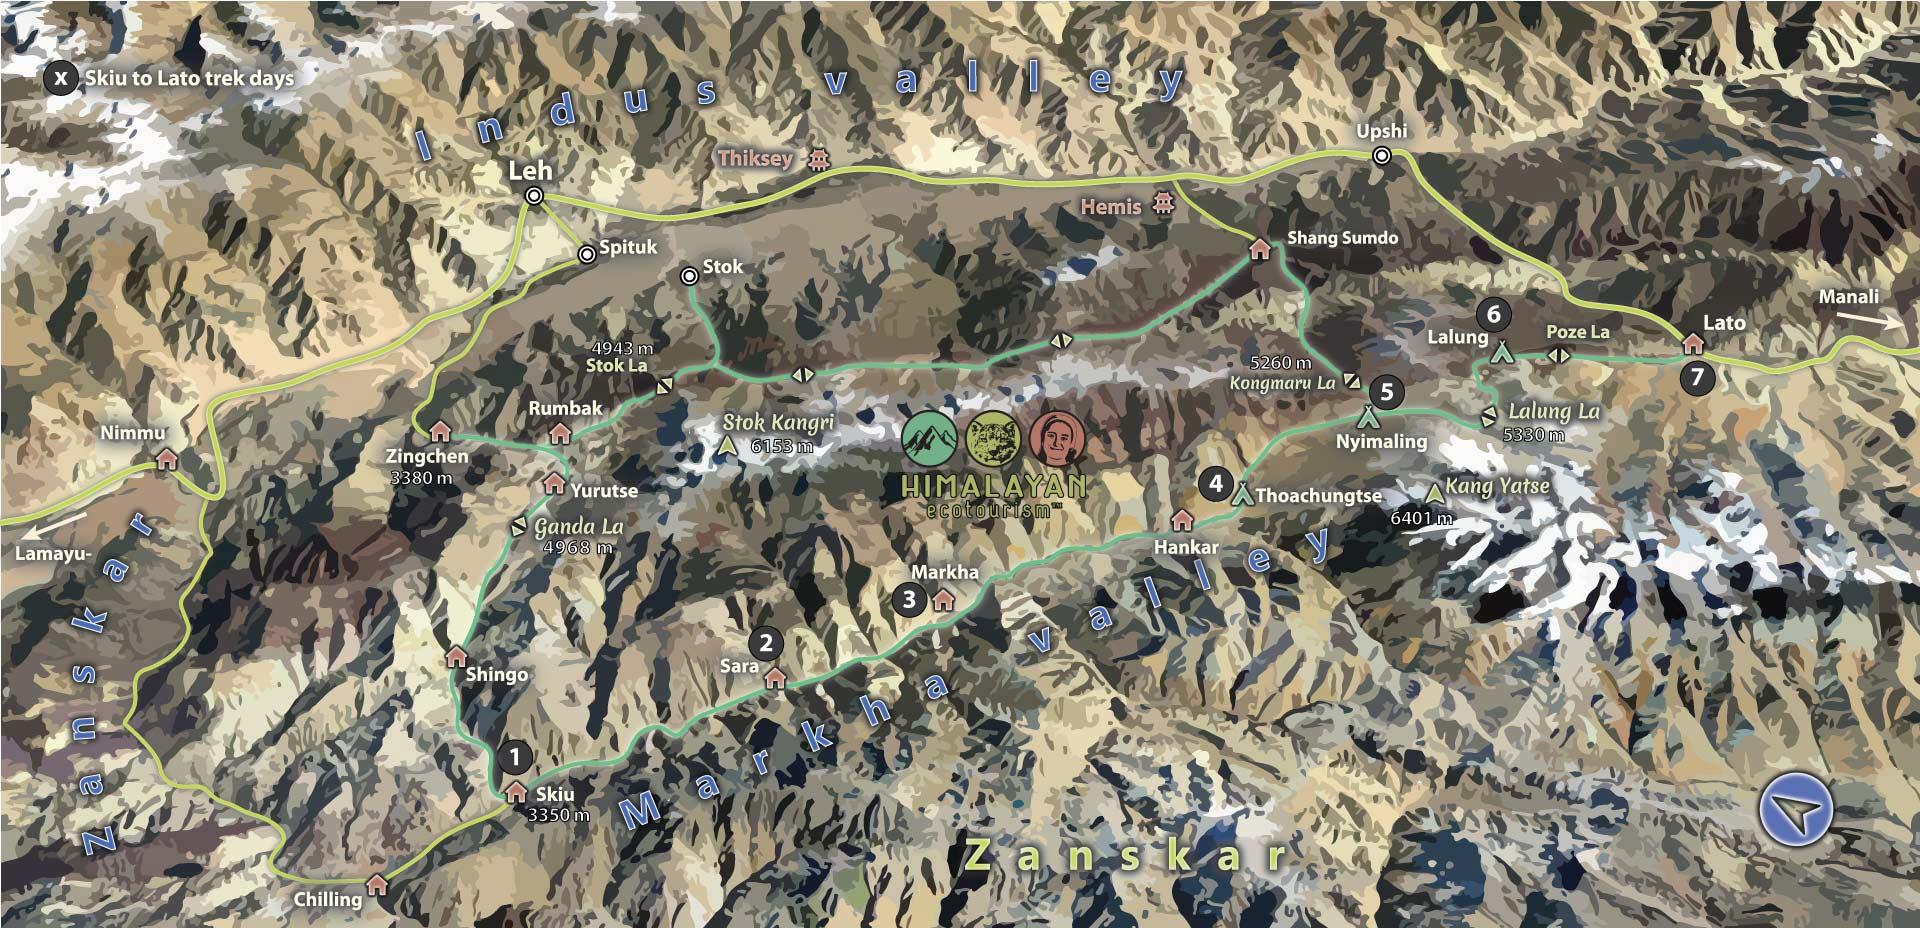 map of the Markha valley treks